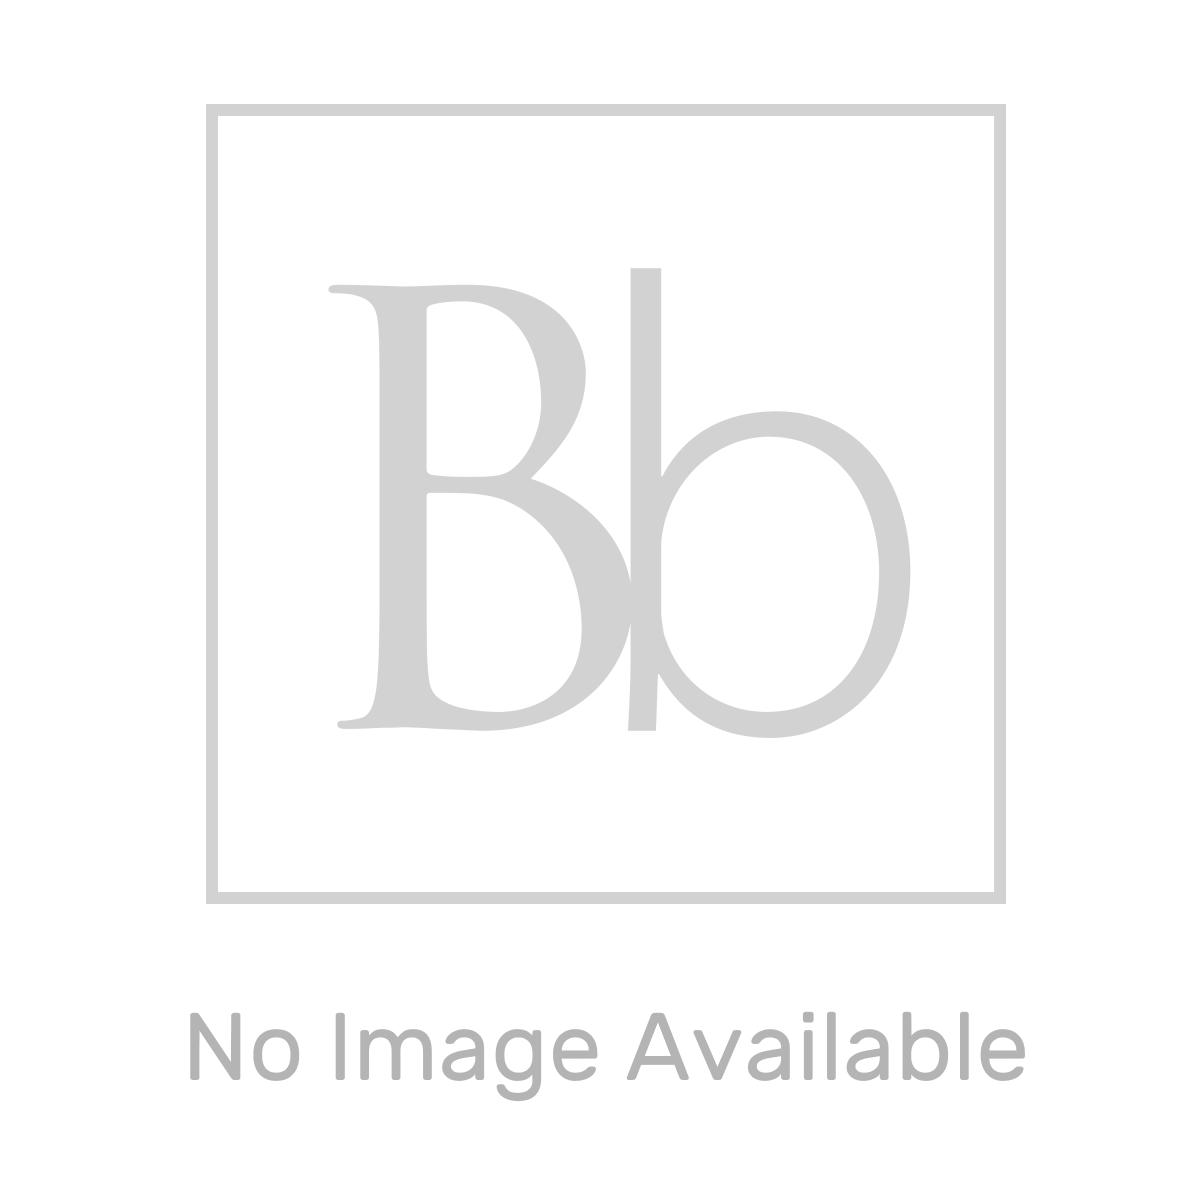 Aquadart Black Slate Shower Tray 1100 x 900 Overhead